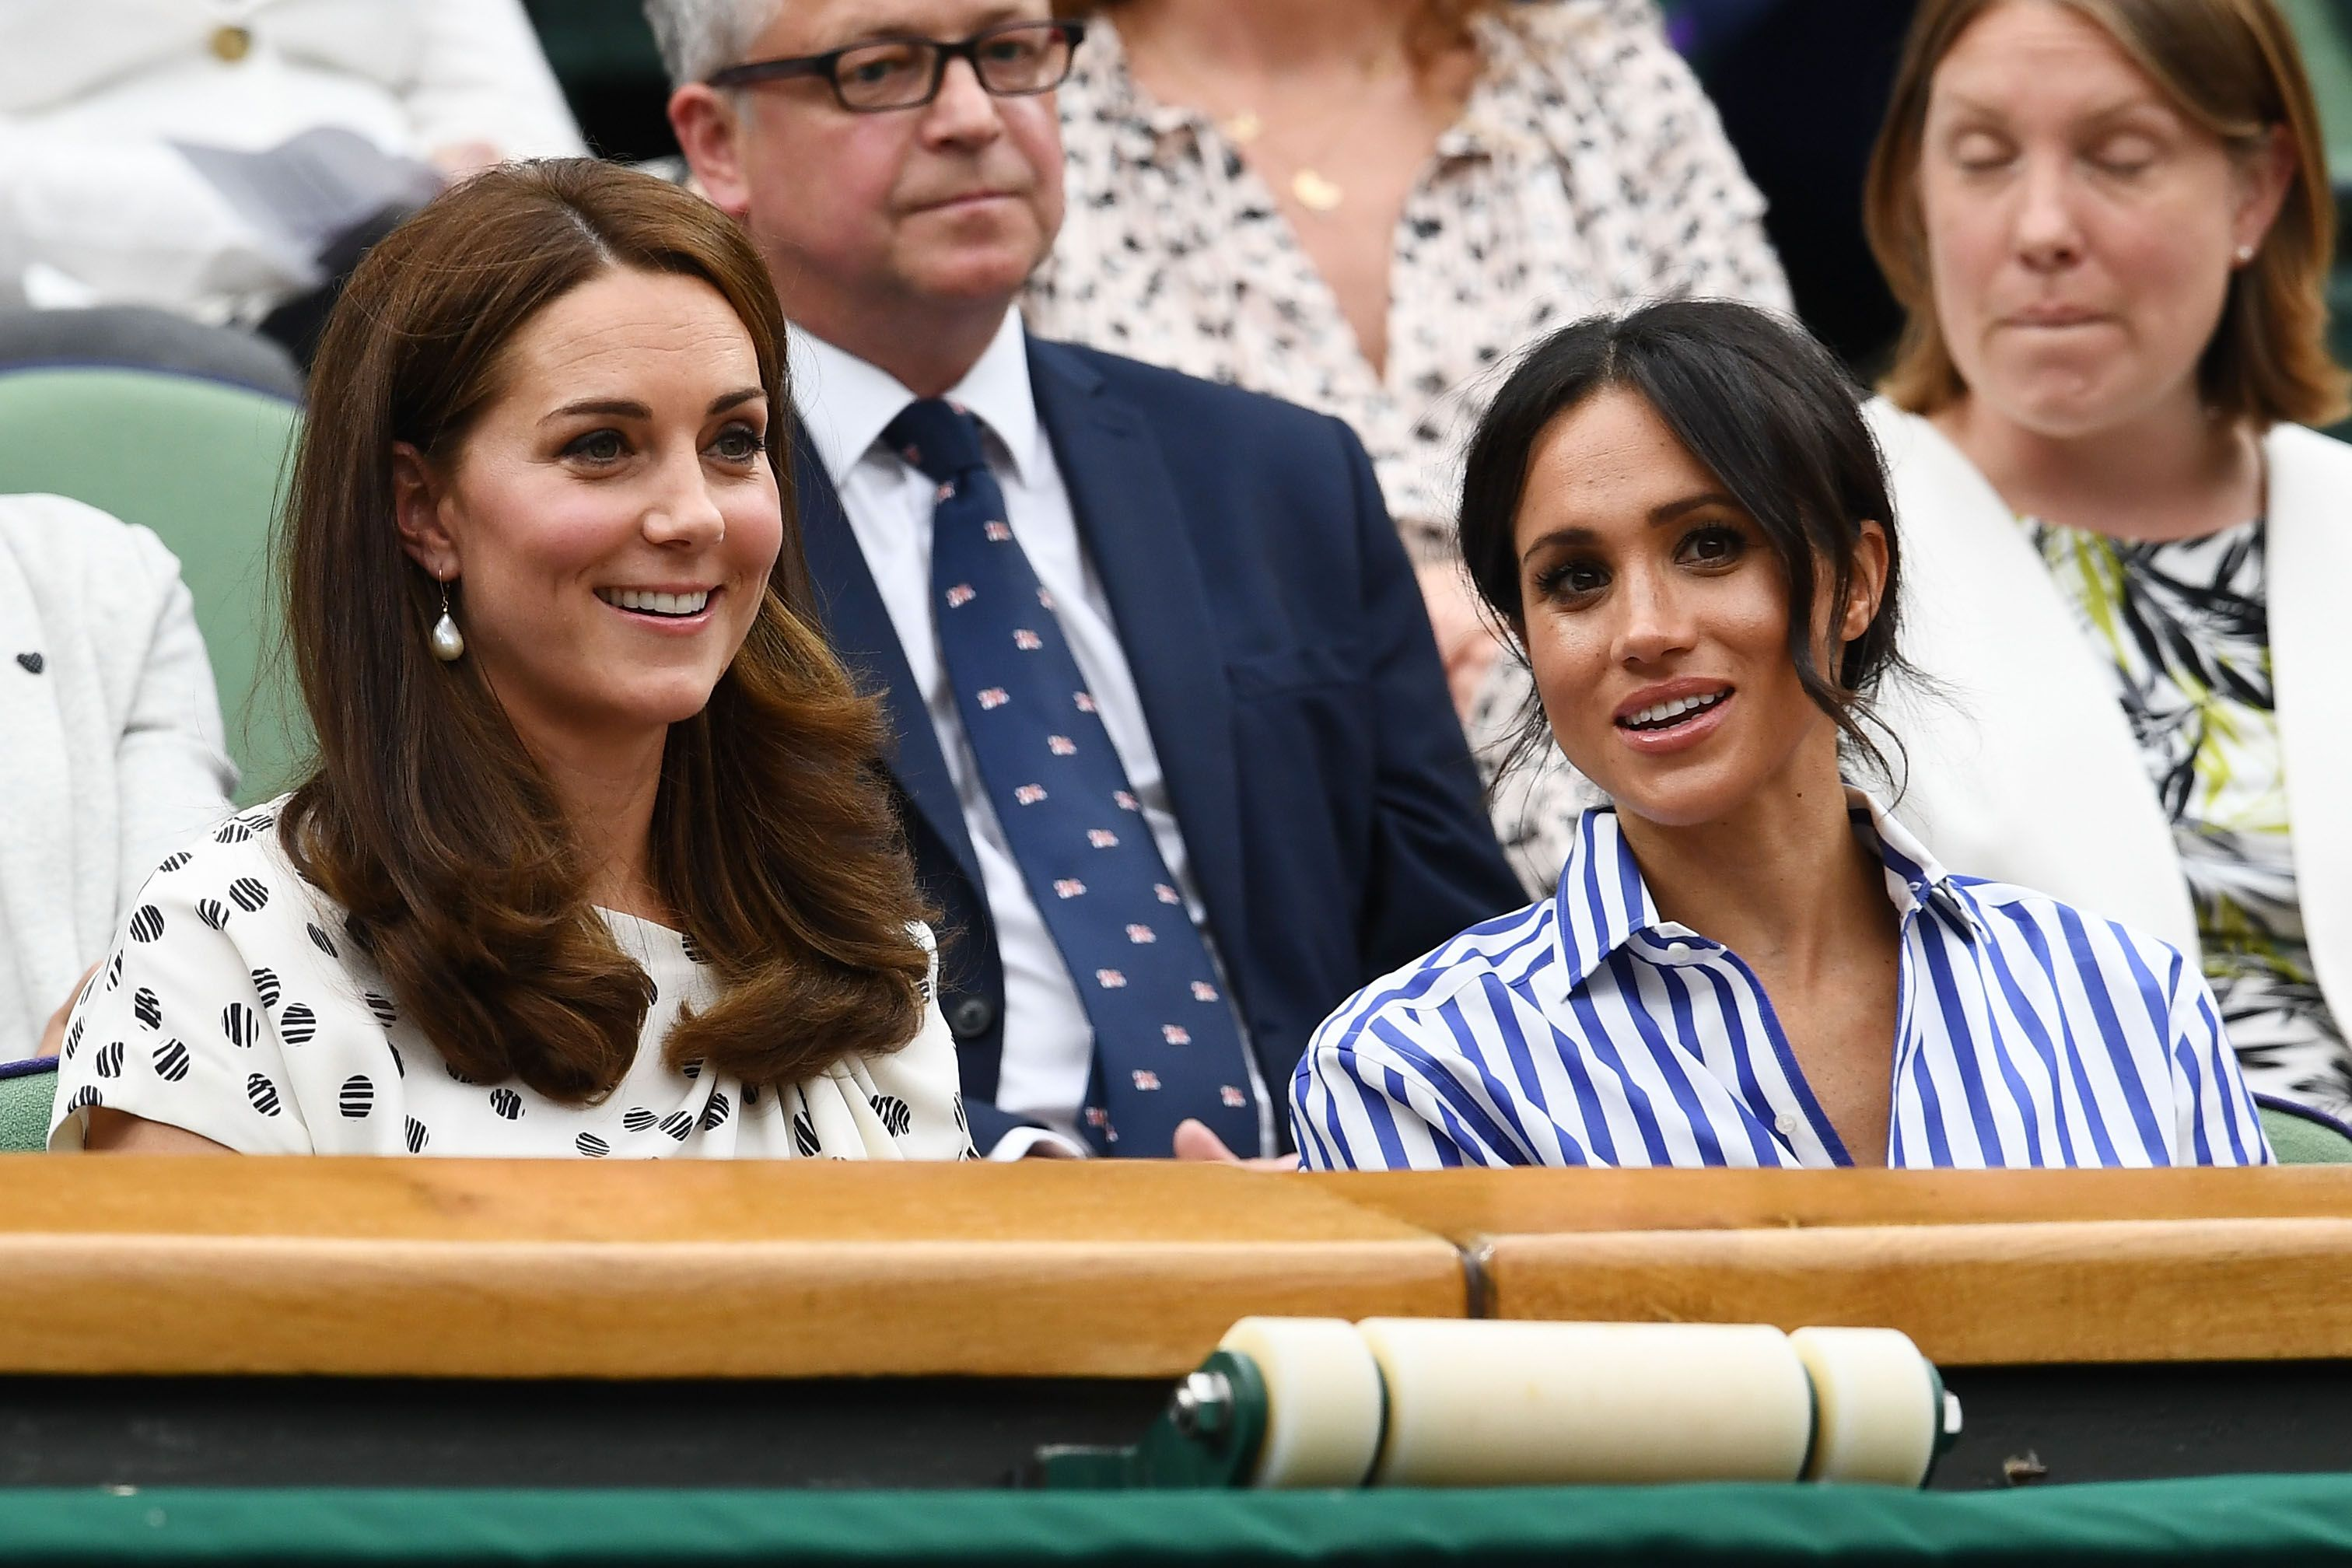 a05f0d4c8d1a Kate Middleton Polka-Dot Dress to Wimbledon 2018 - Duchess of Cambridge  Watches Serena Williams